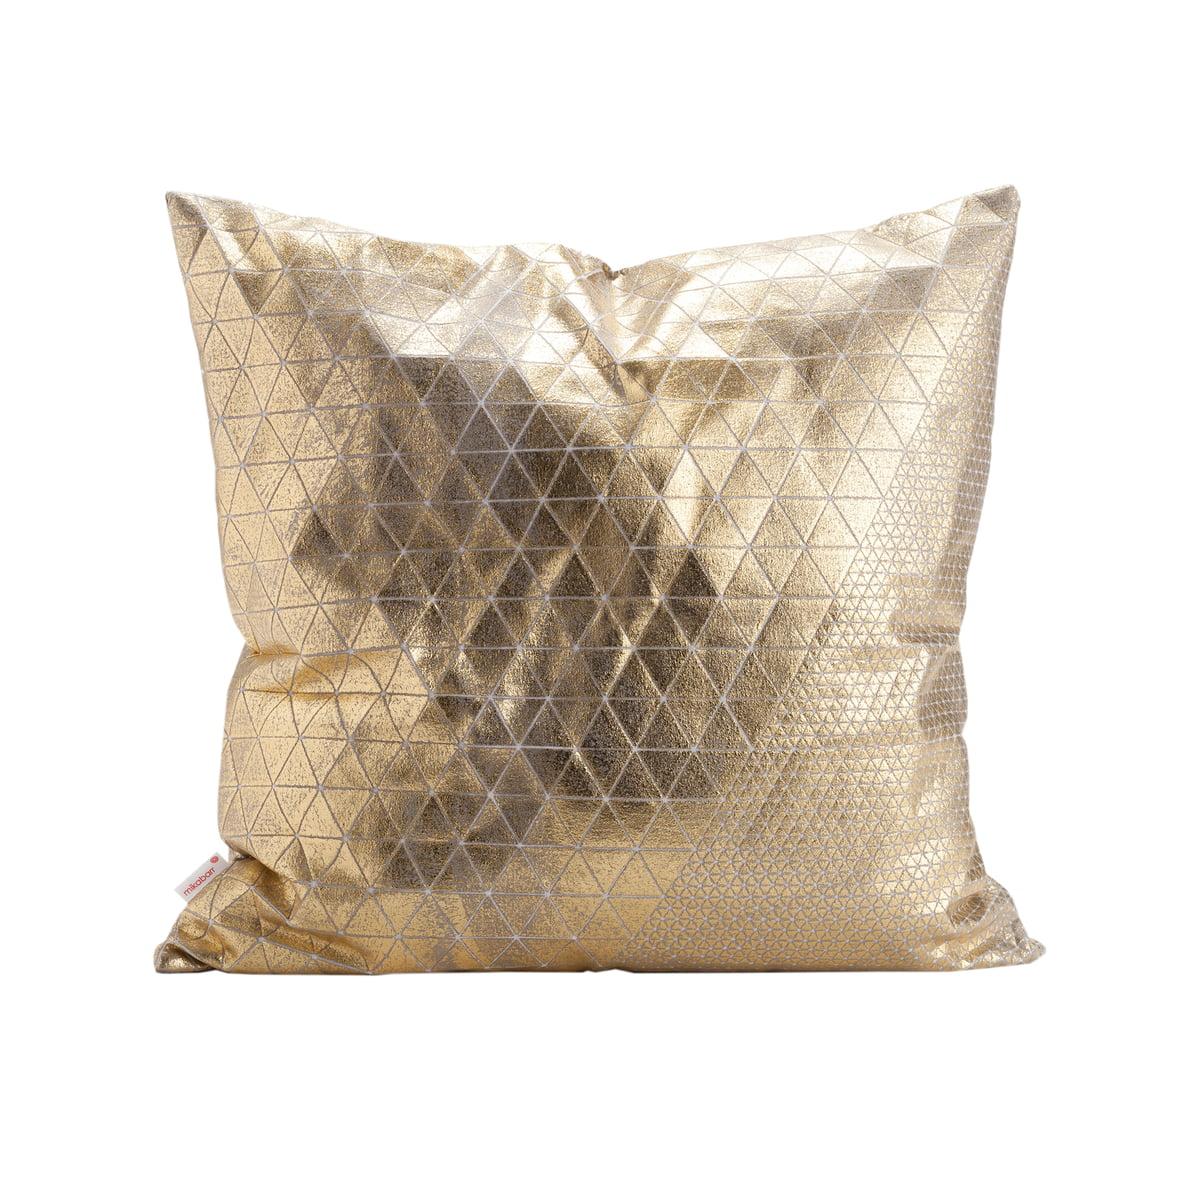 Mika barr bling kissenbezug 50x50 cm gold grau freisteller